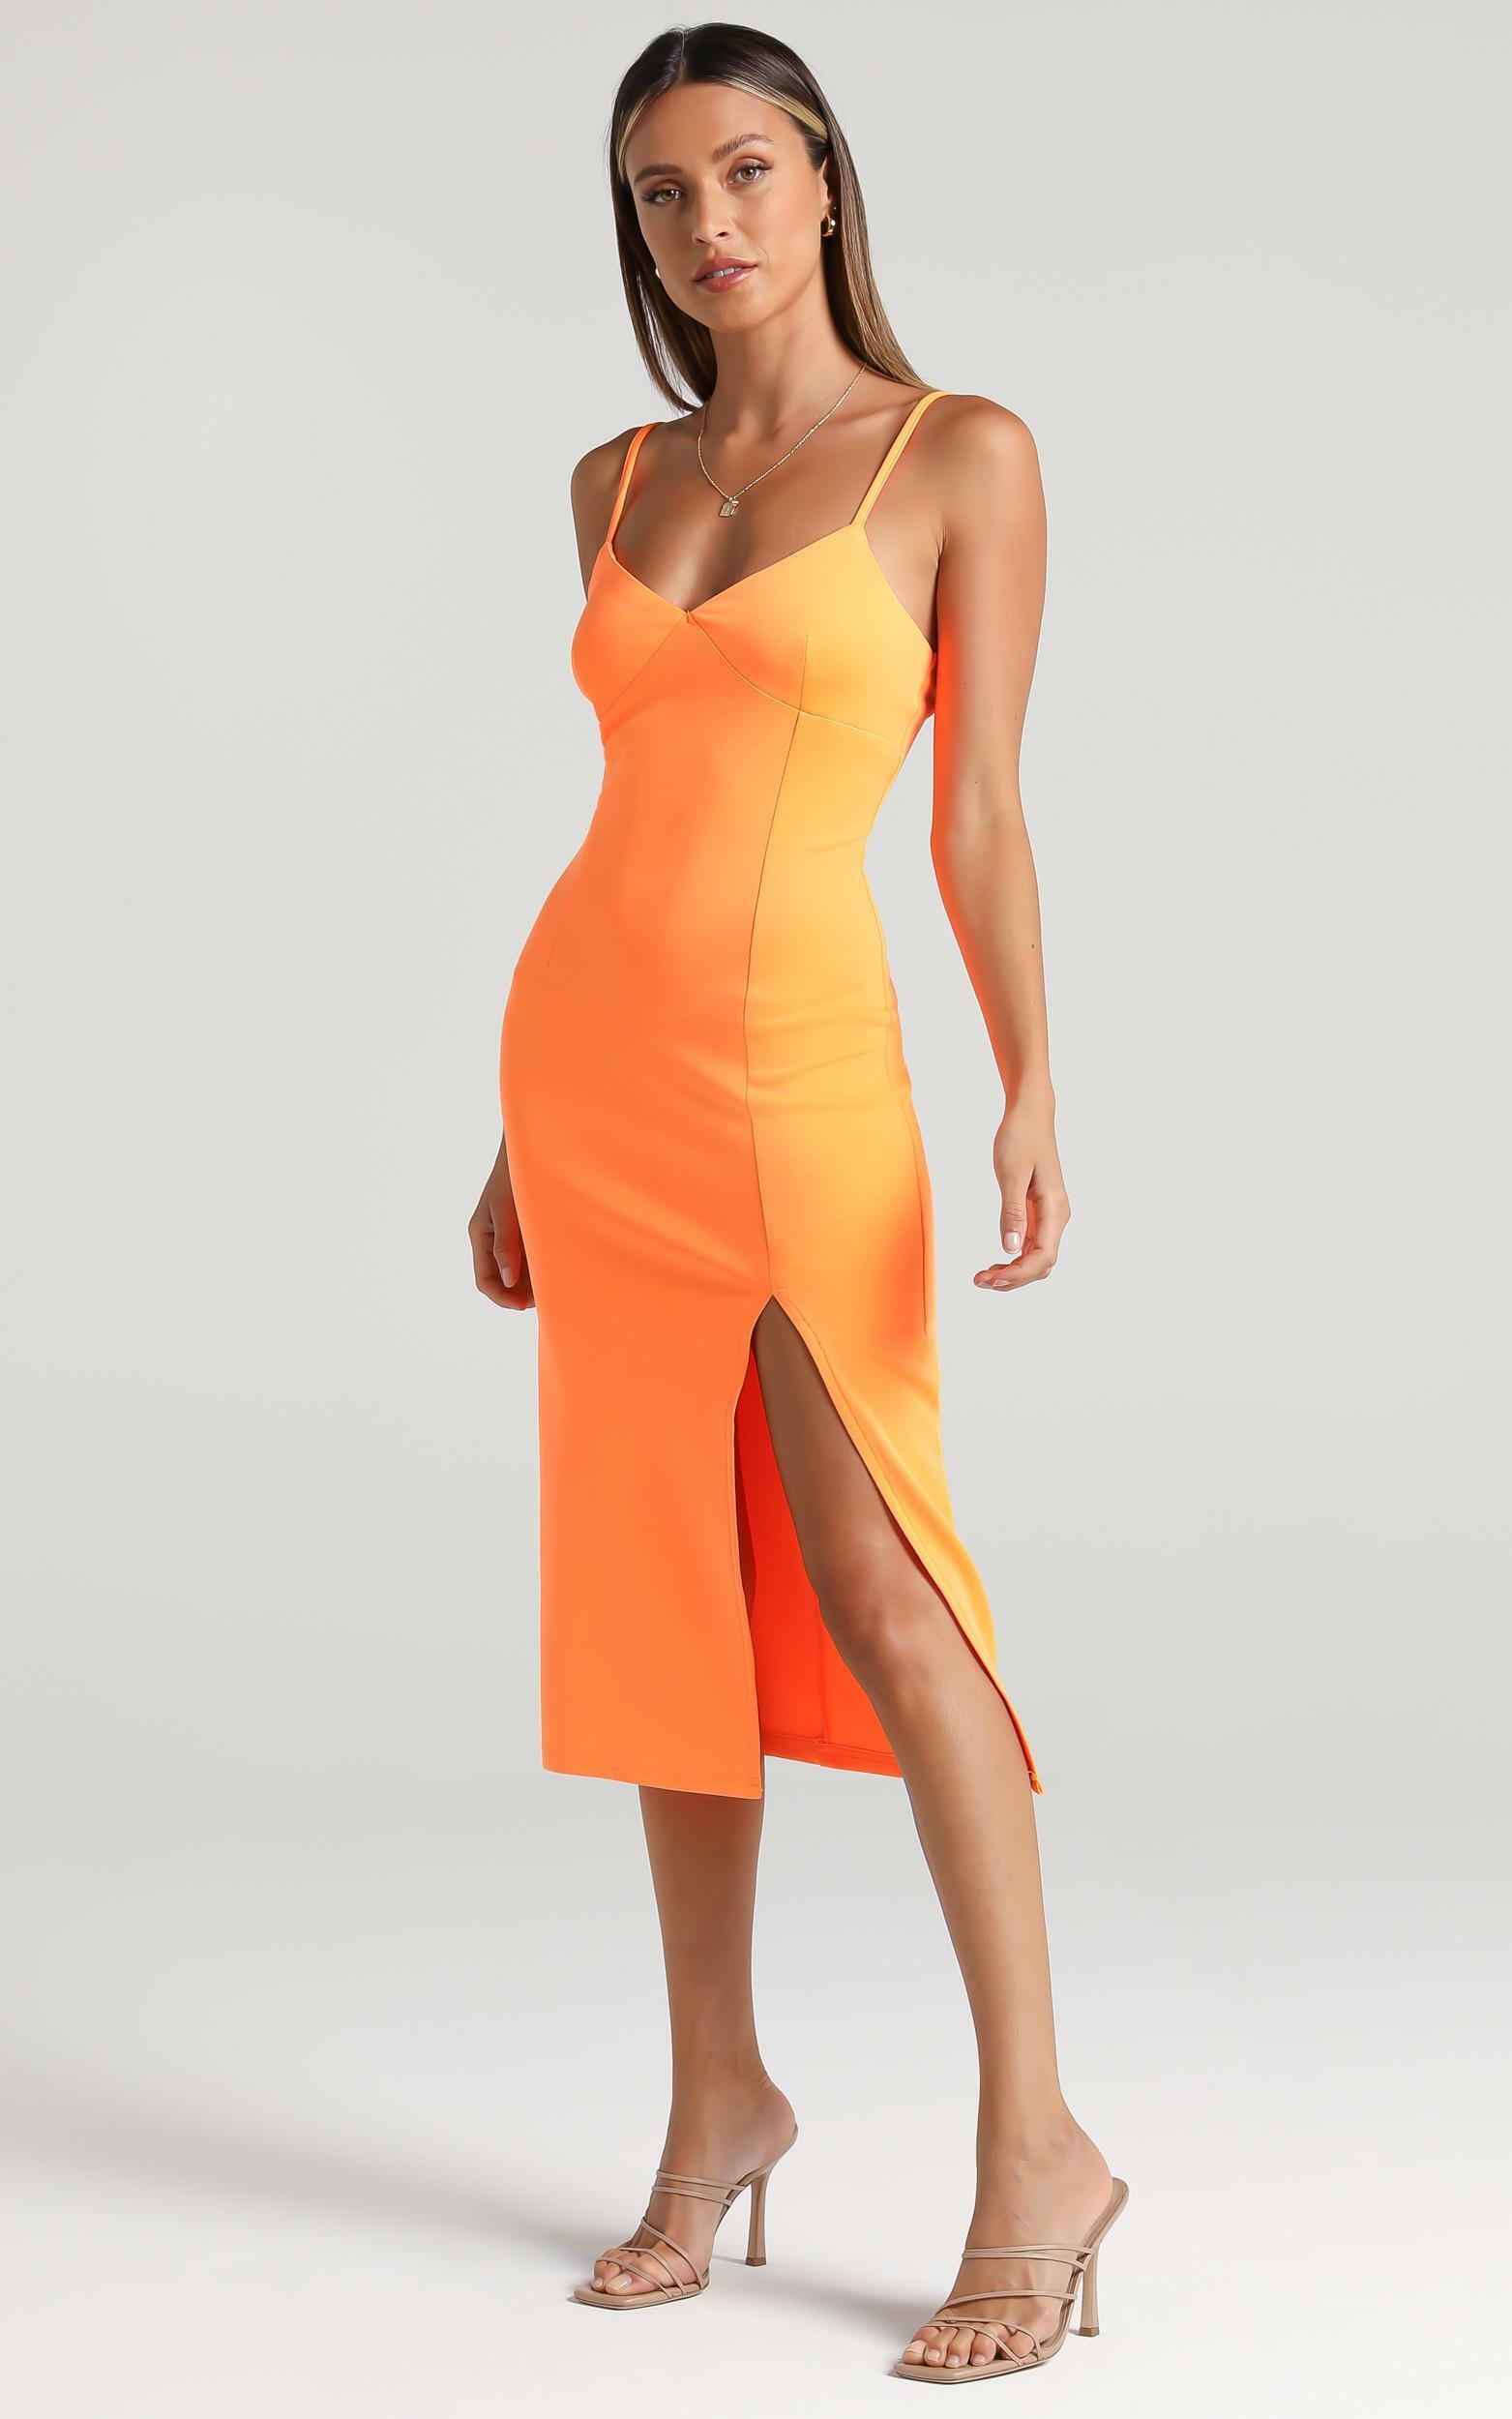 Amaliah Dress in Orange - 6 (XS), Orange, hi-res image number null